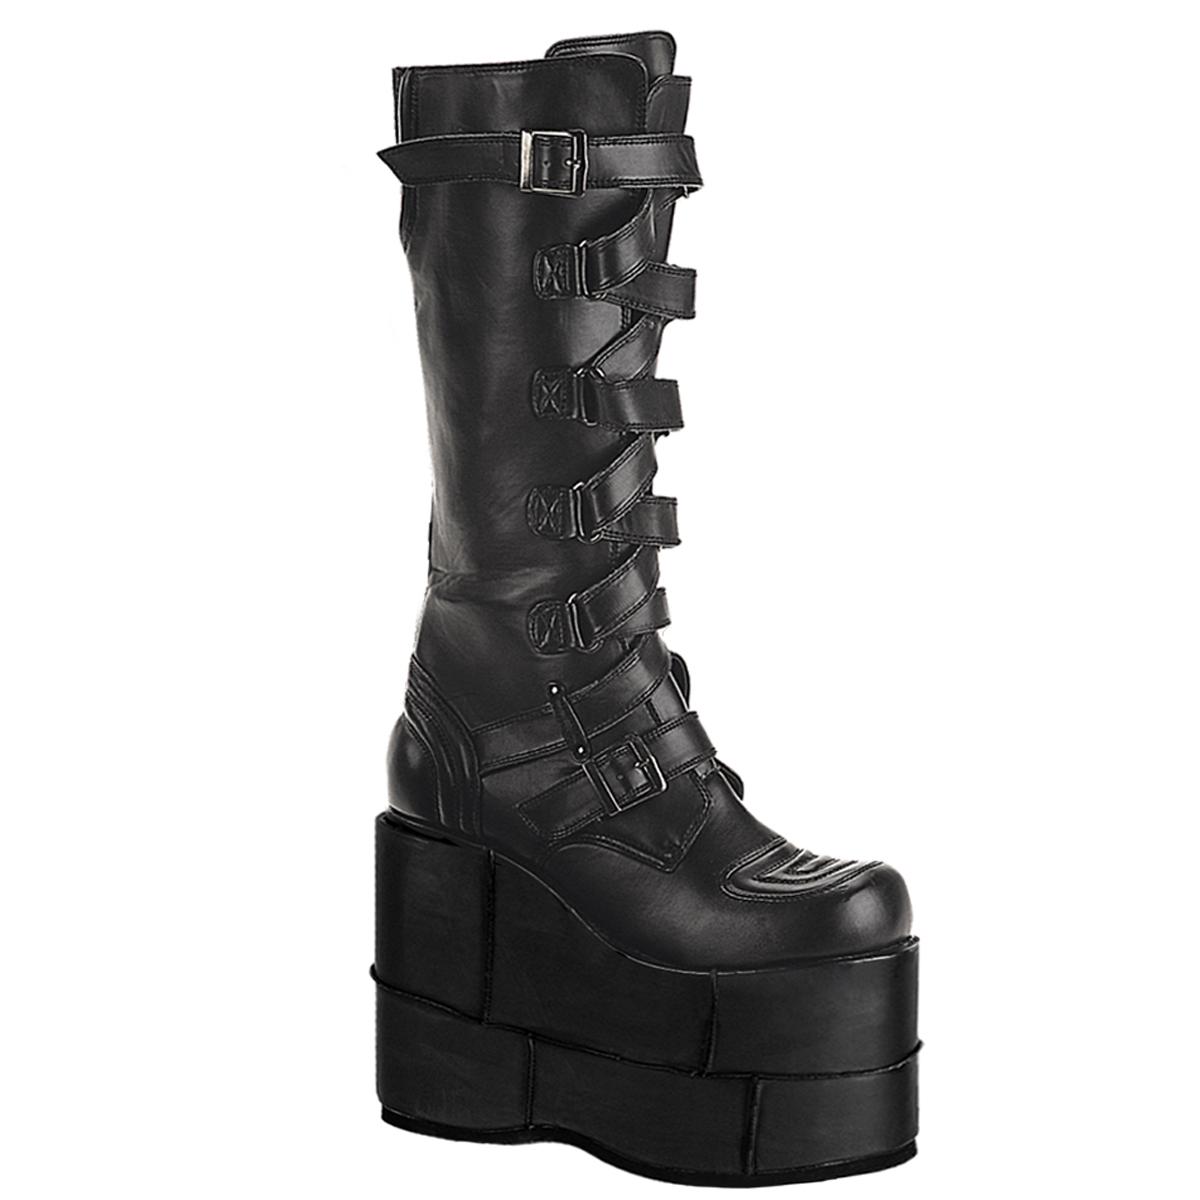 order detailed look website for discount Platform Boots STACK-308 - PU Black, Demonia